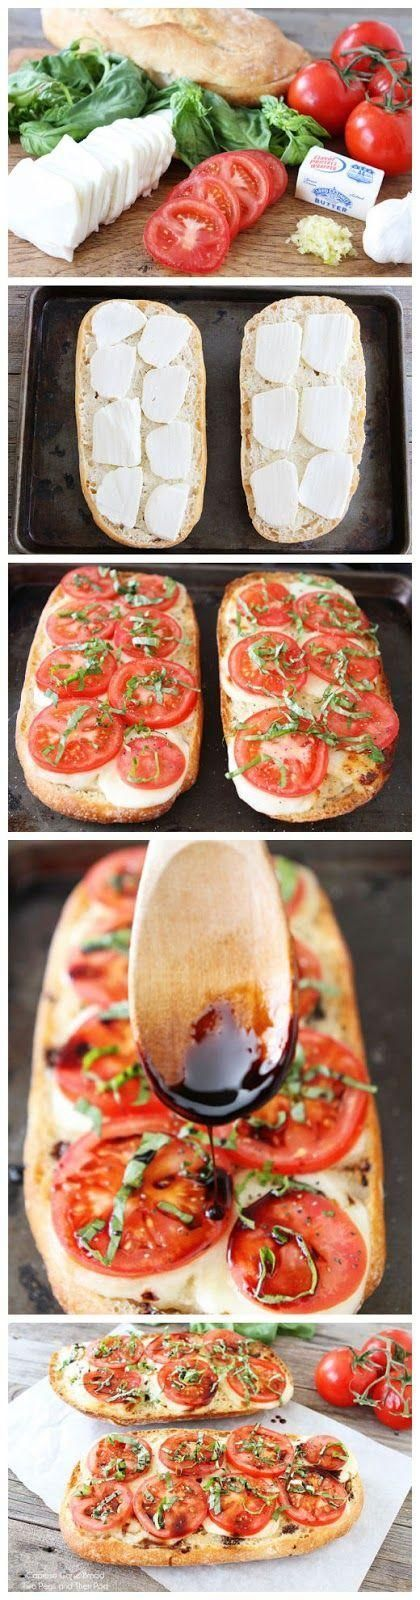 Caprese Garlic Bread - Love this recipe